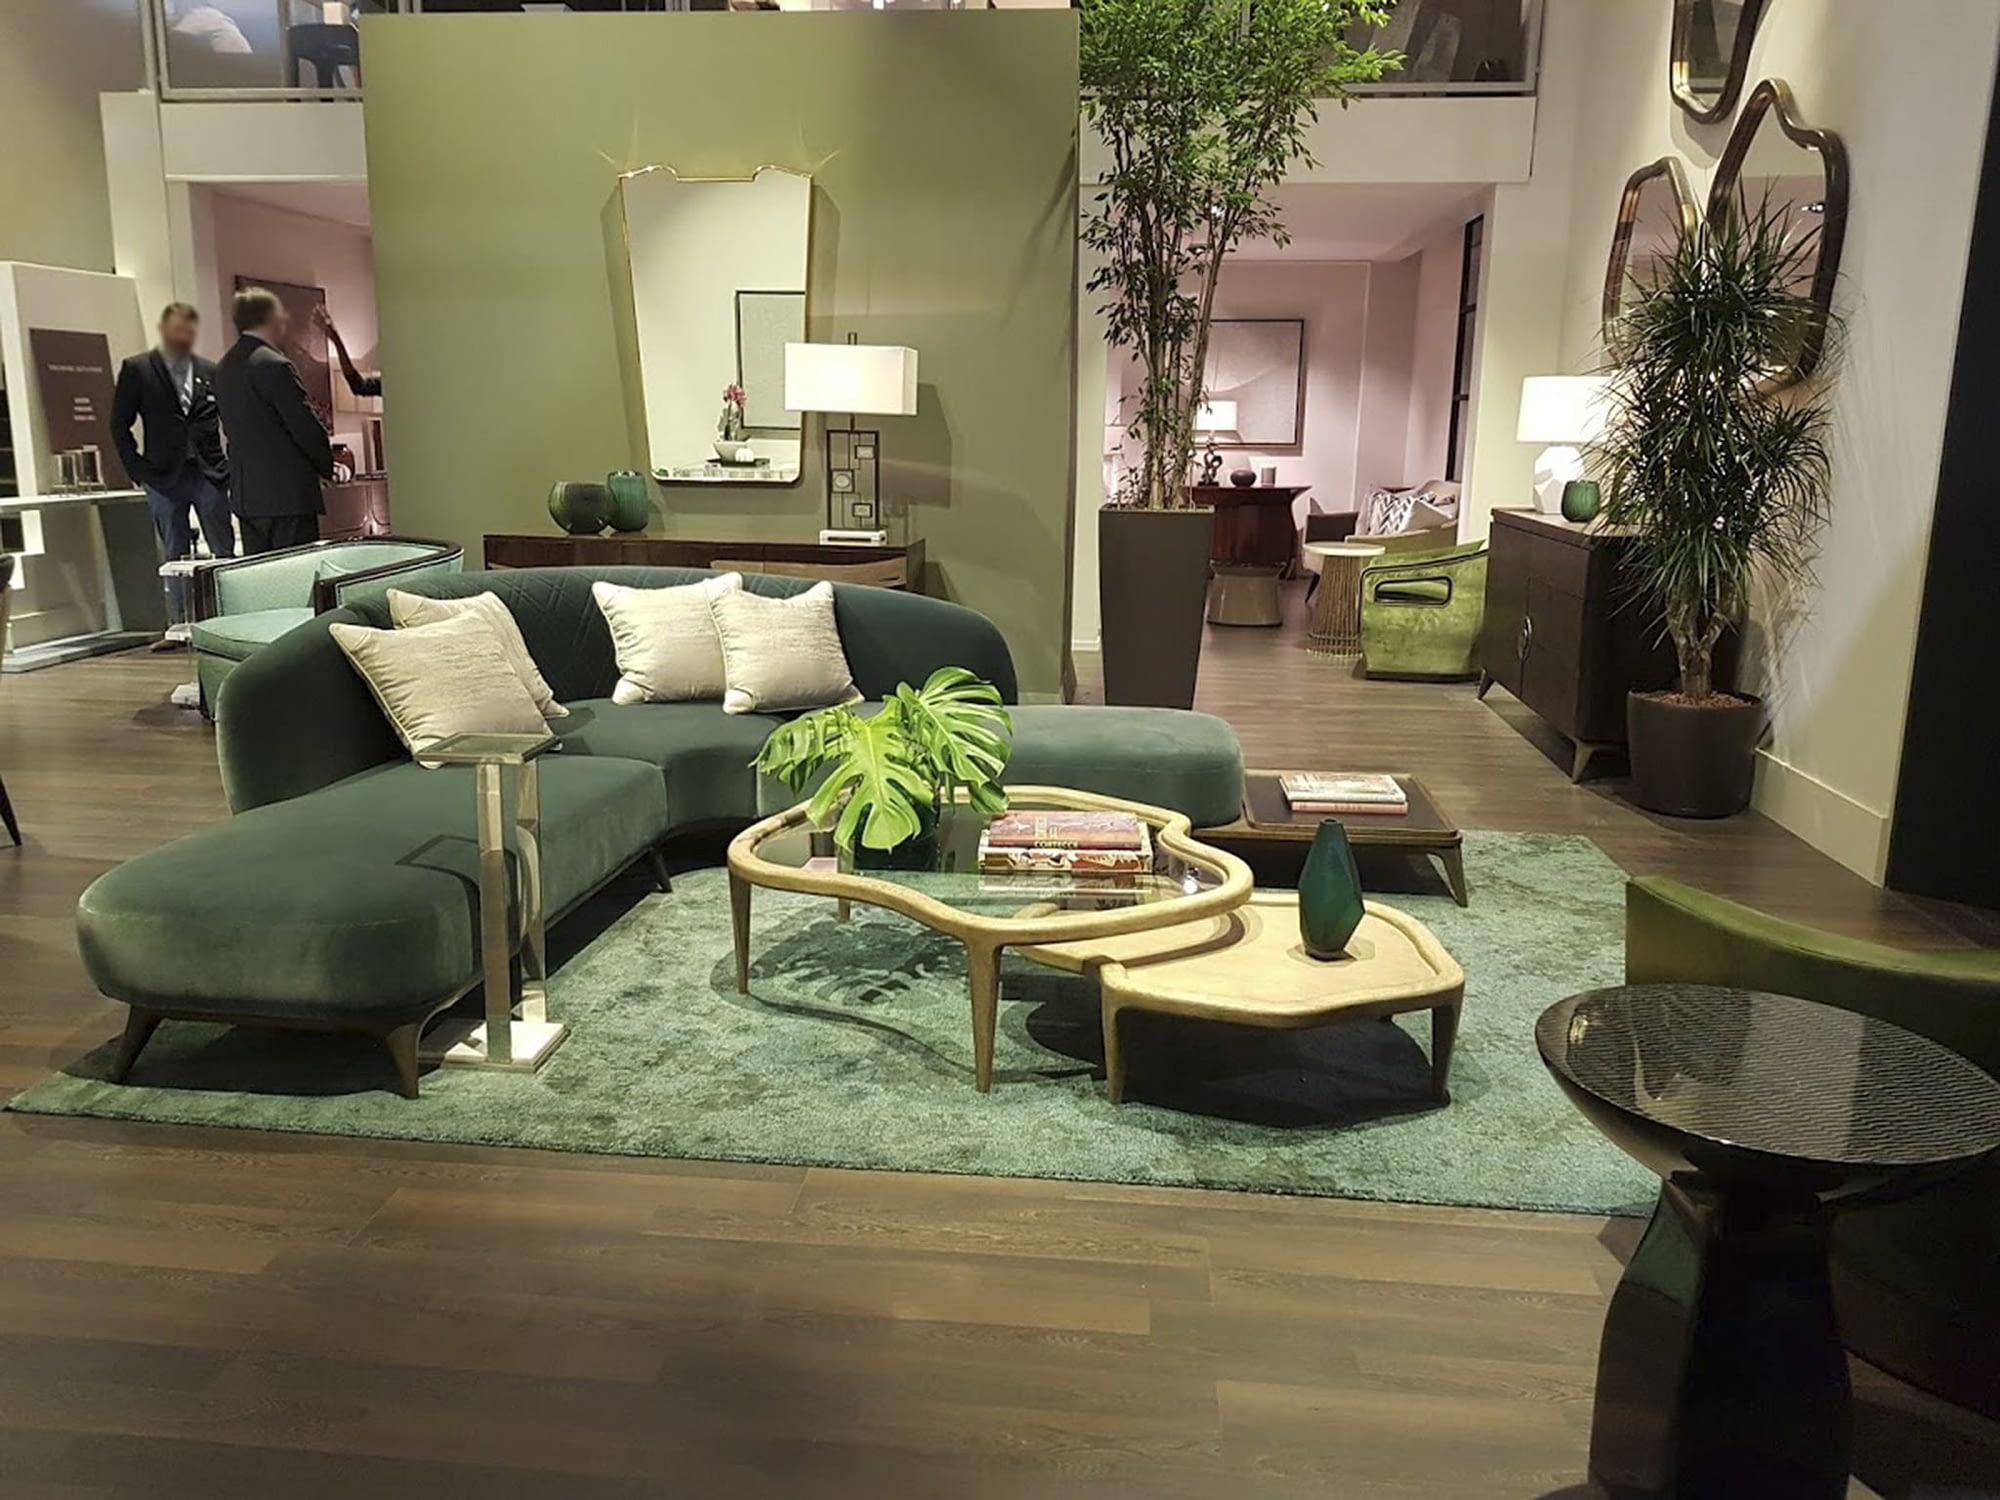 Milano Design Week 2018 - Salone del Mobile 20